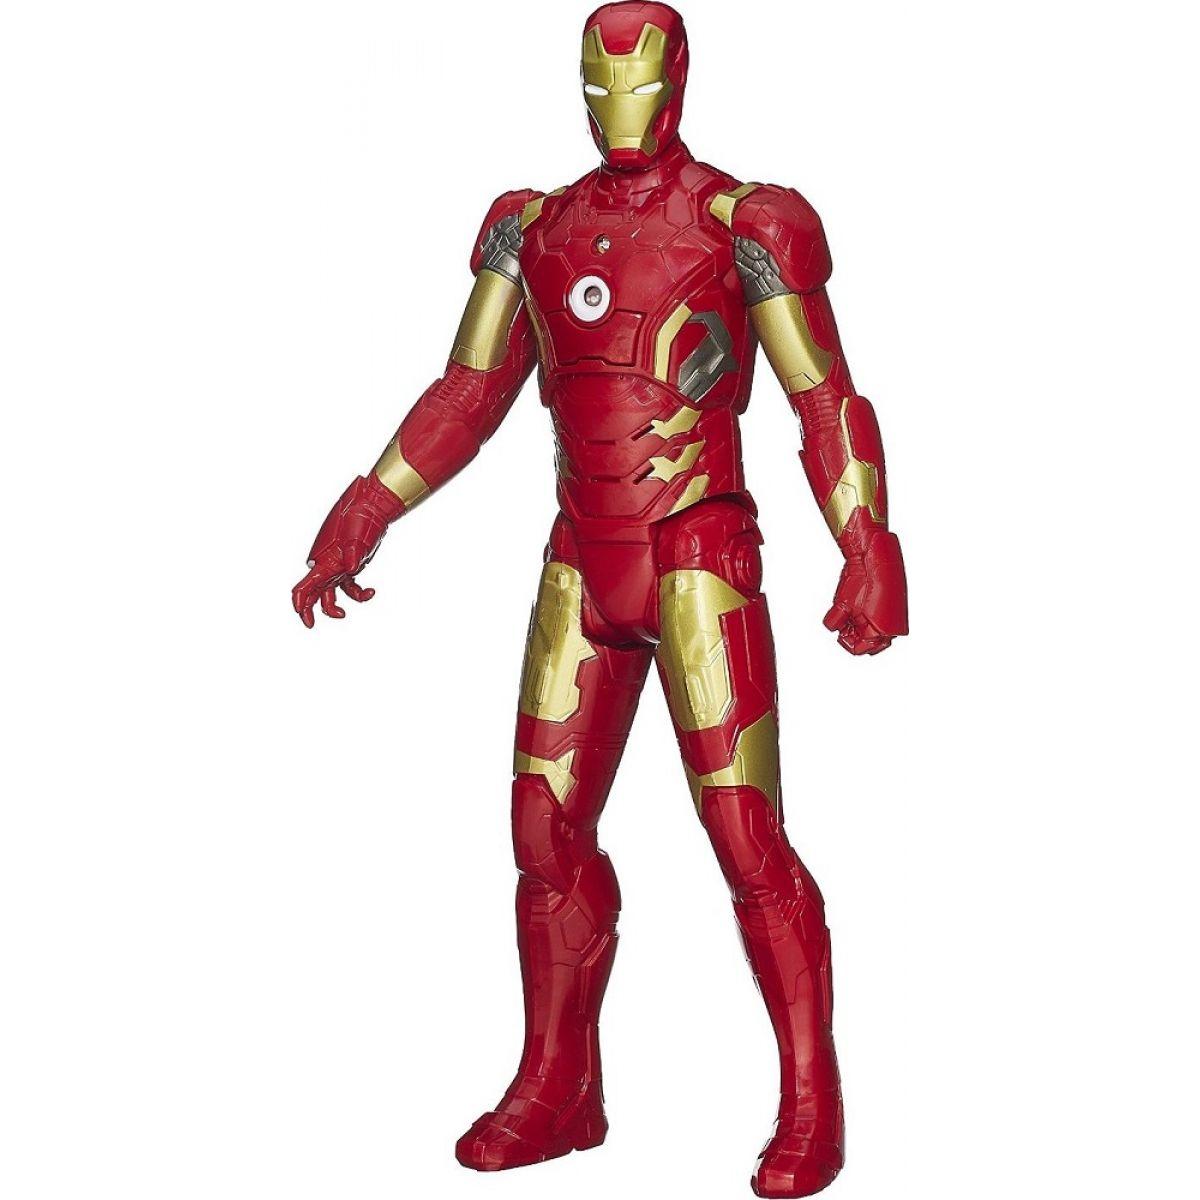 Hasbro Avengers Elektronická figurka 30 cm - Iron Man Mark 43